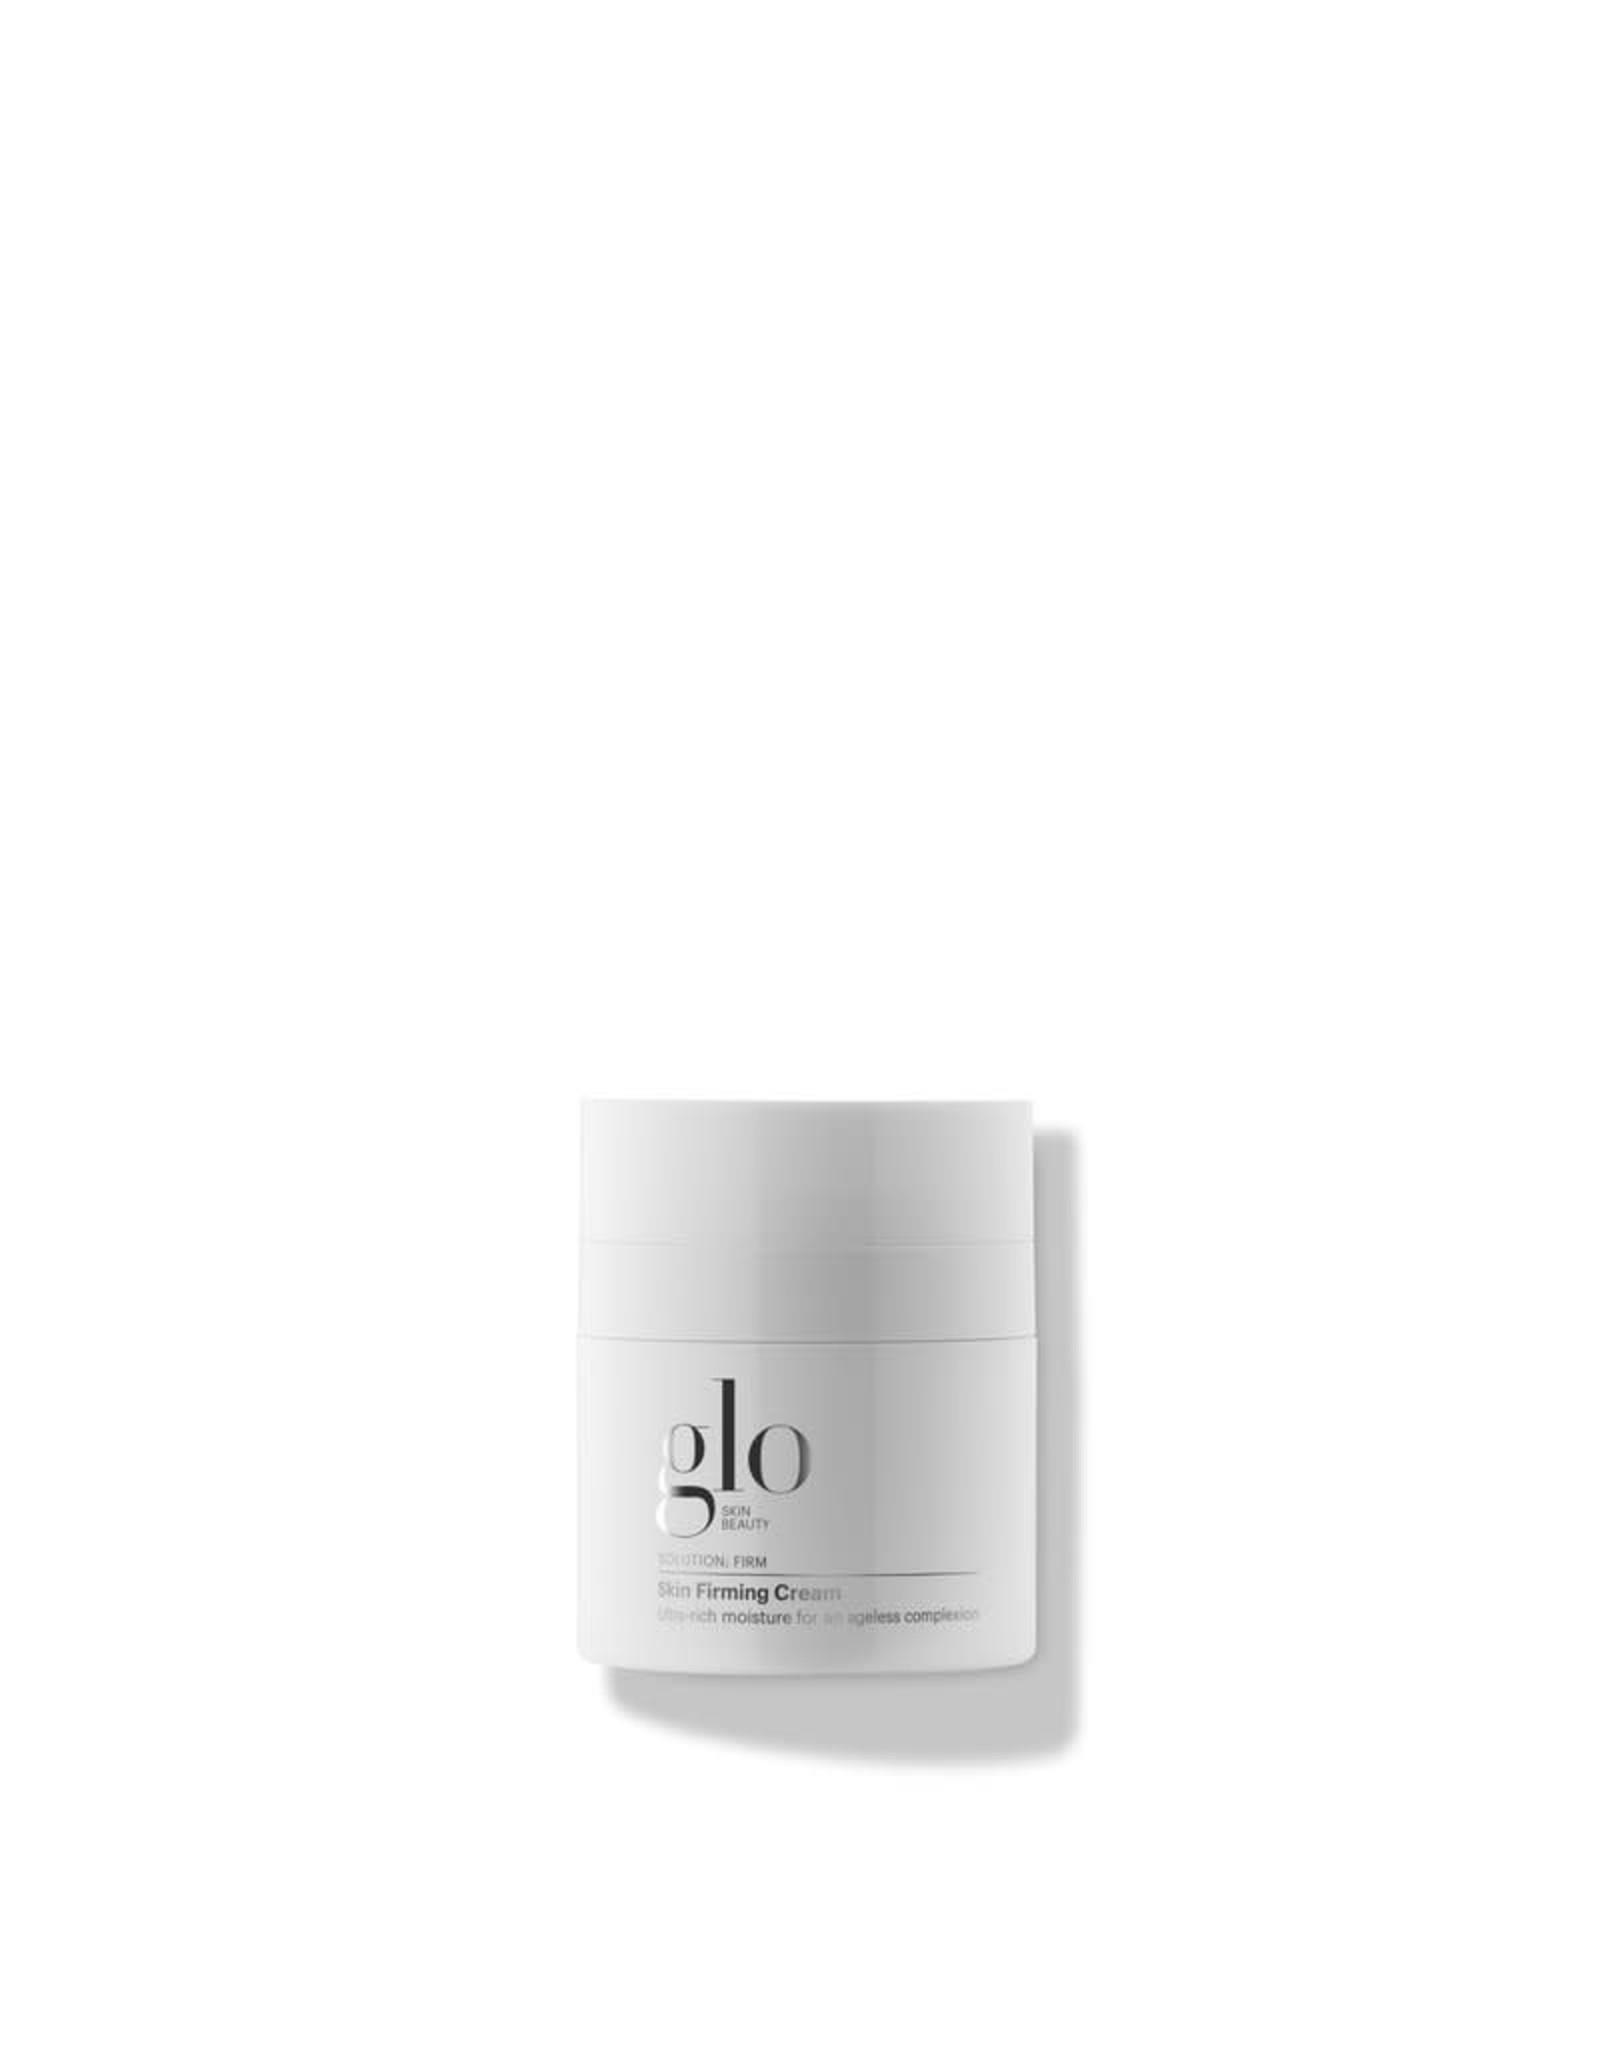 Glo Skin Beauty Skin Firming Cream